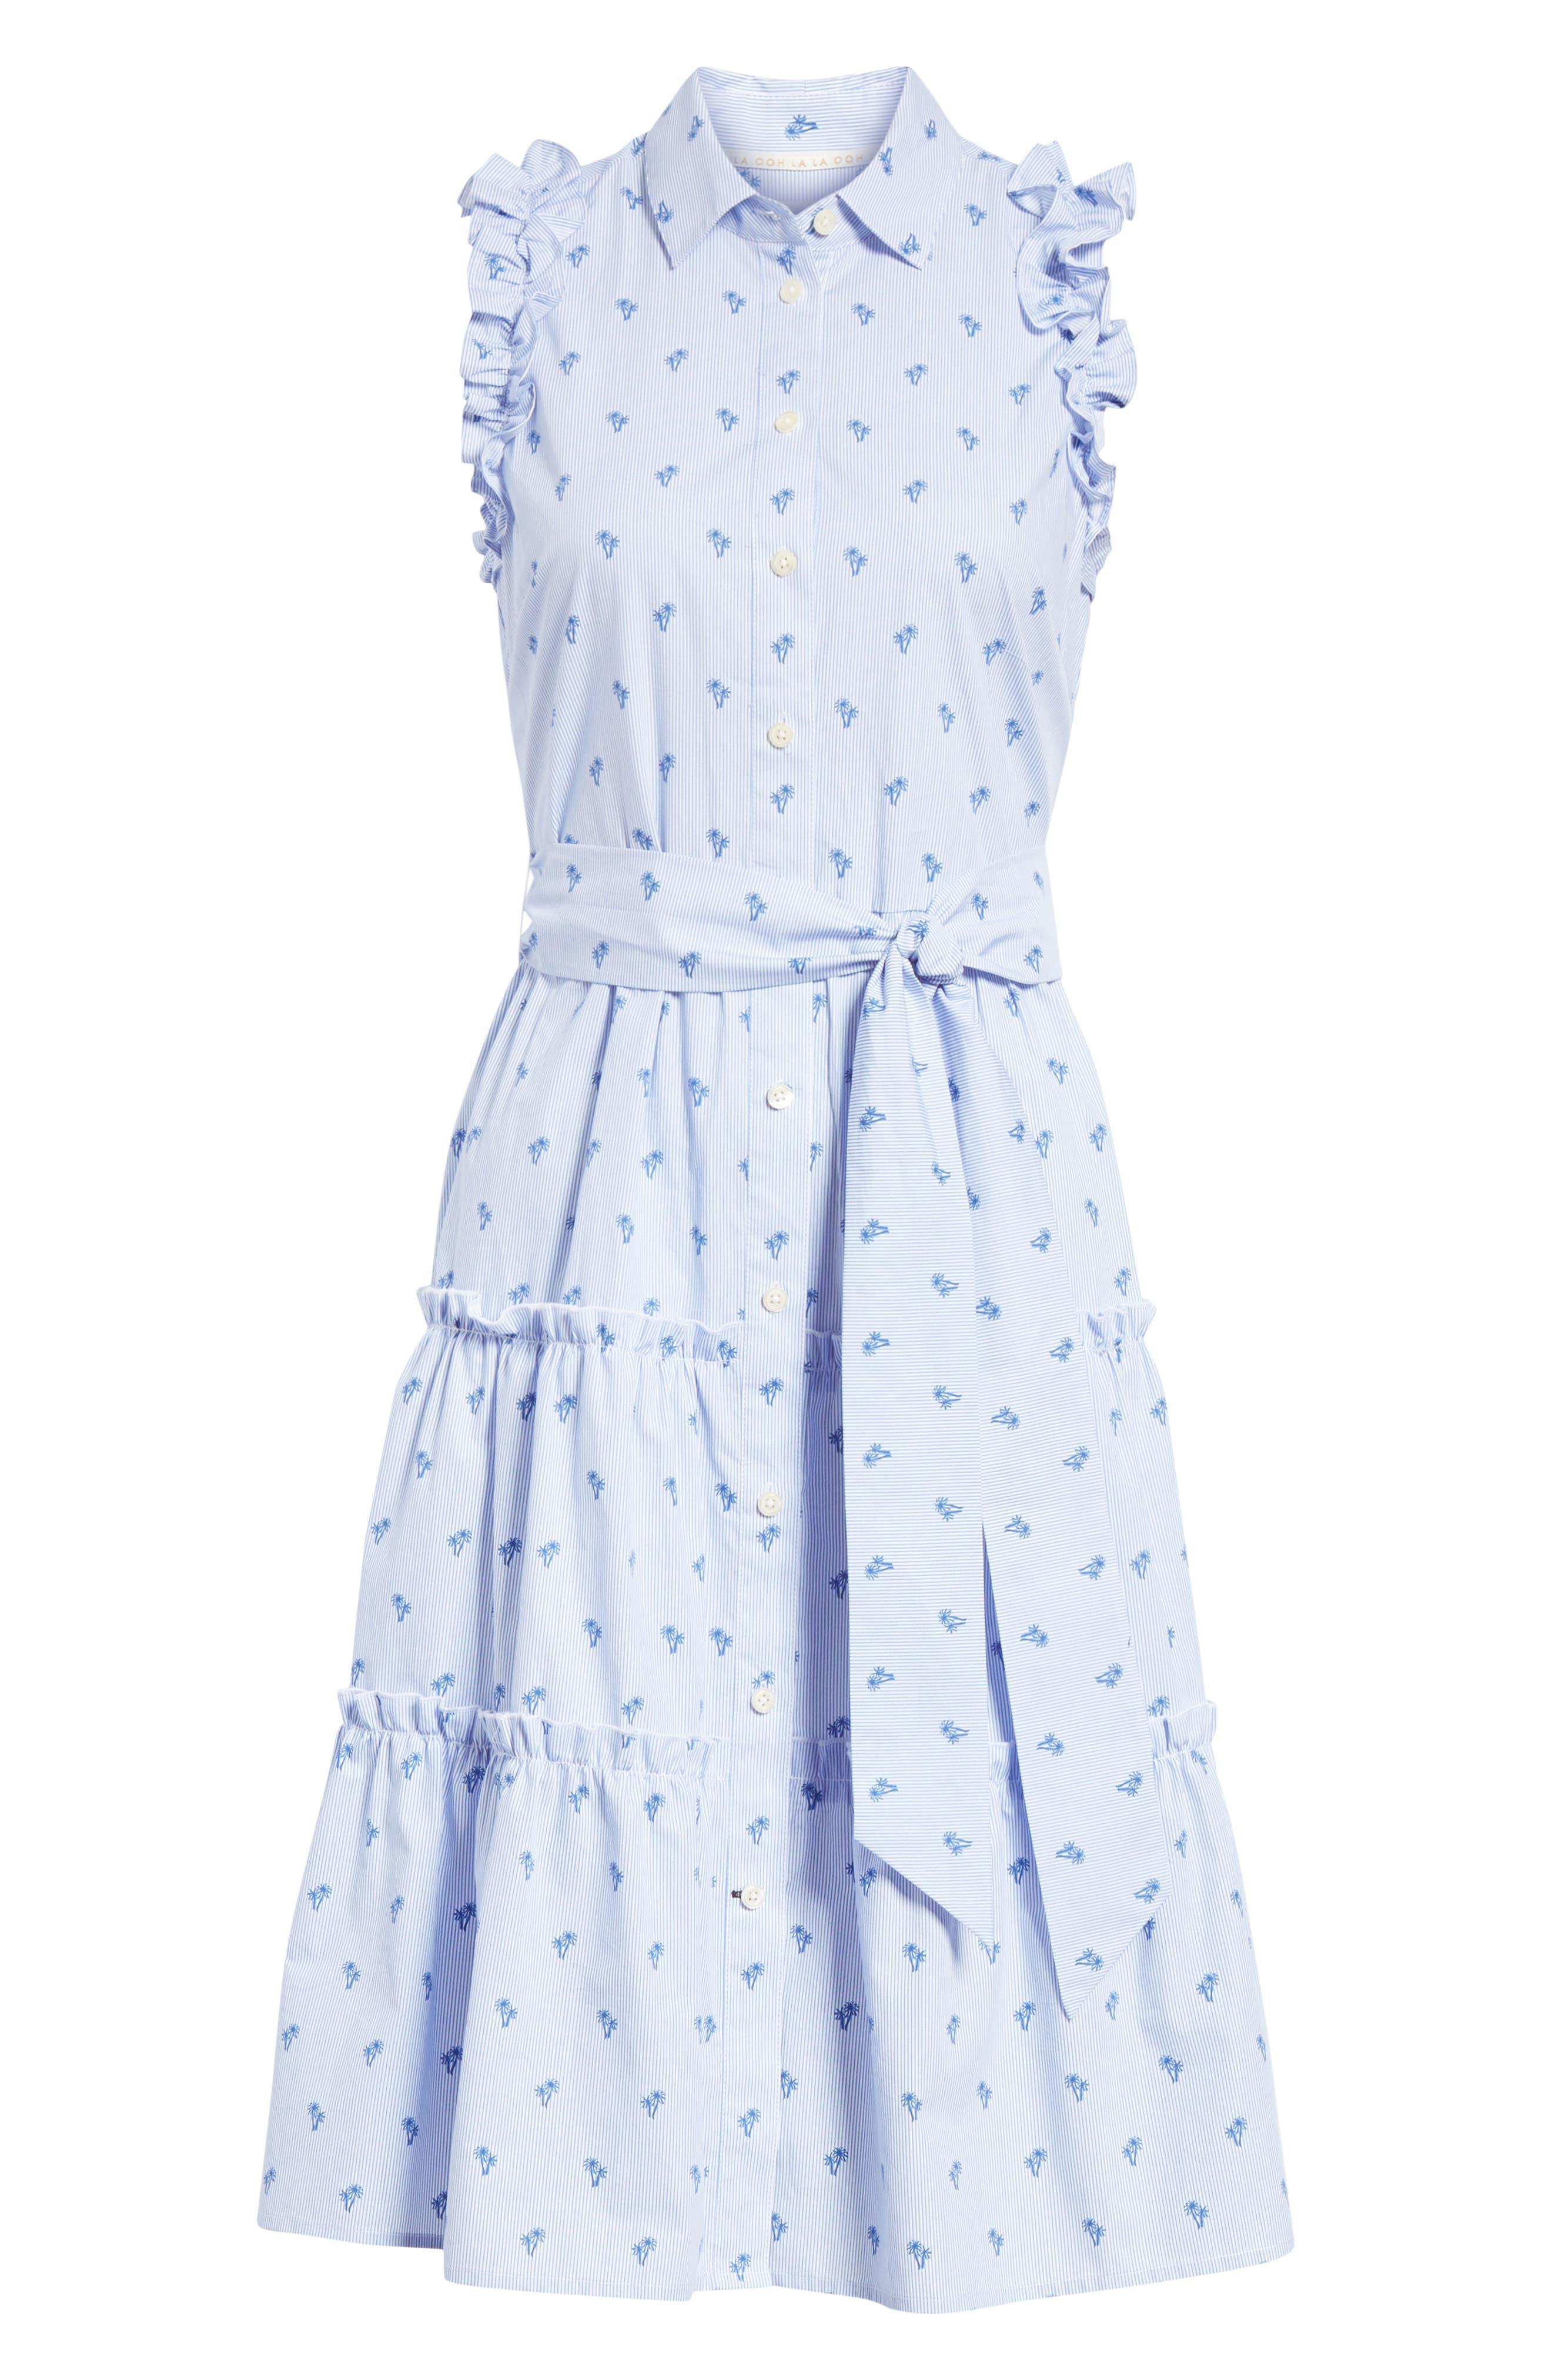 palm tree pinstripe sleeveless cotton dress,                             Alternate thumbnail 6, color,                             436